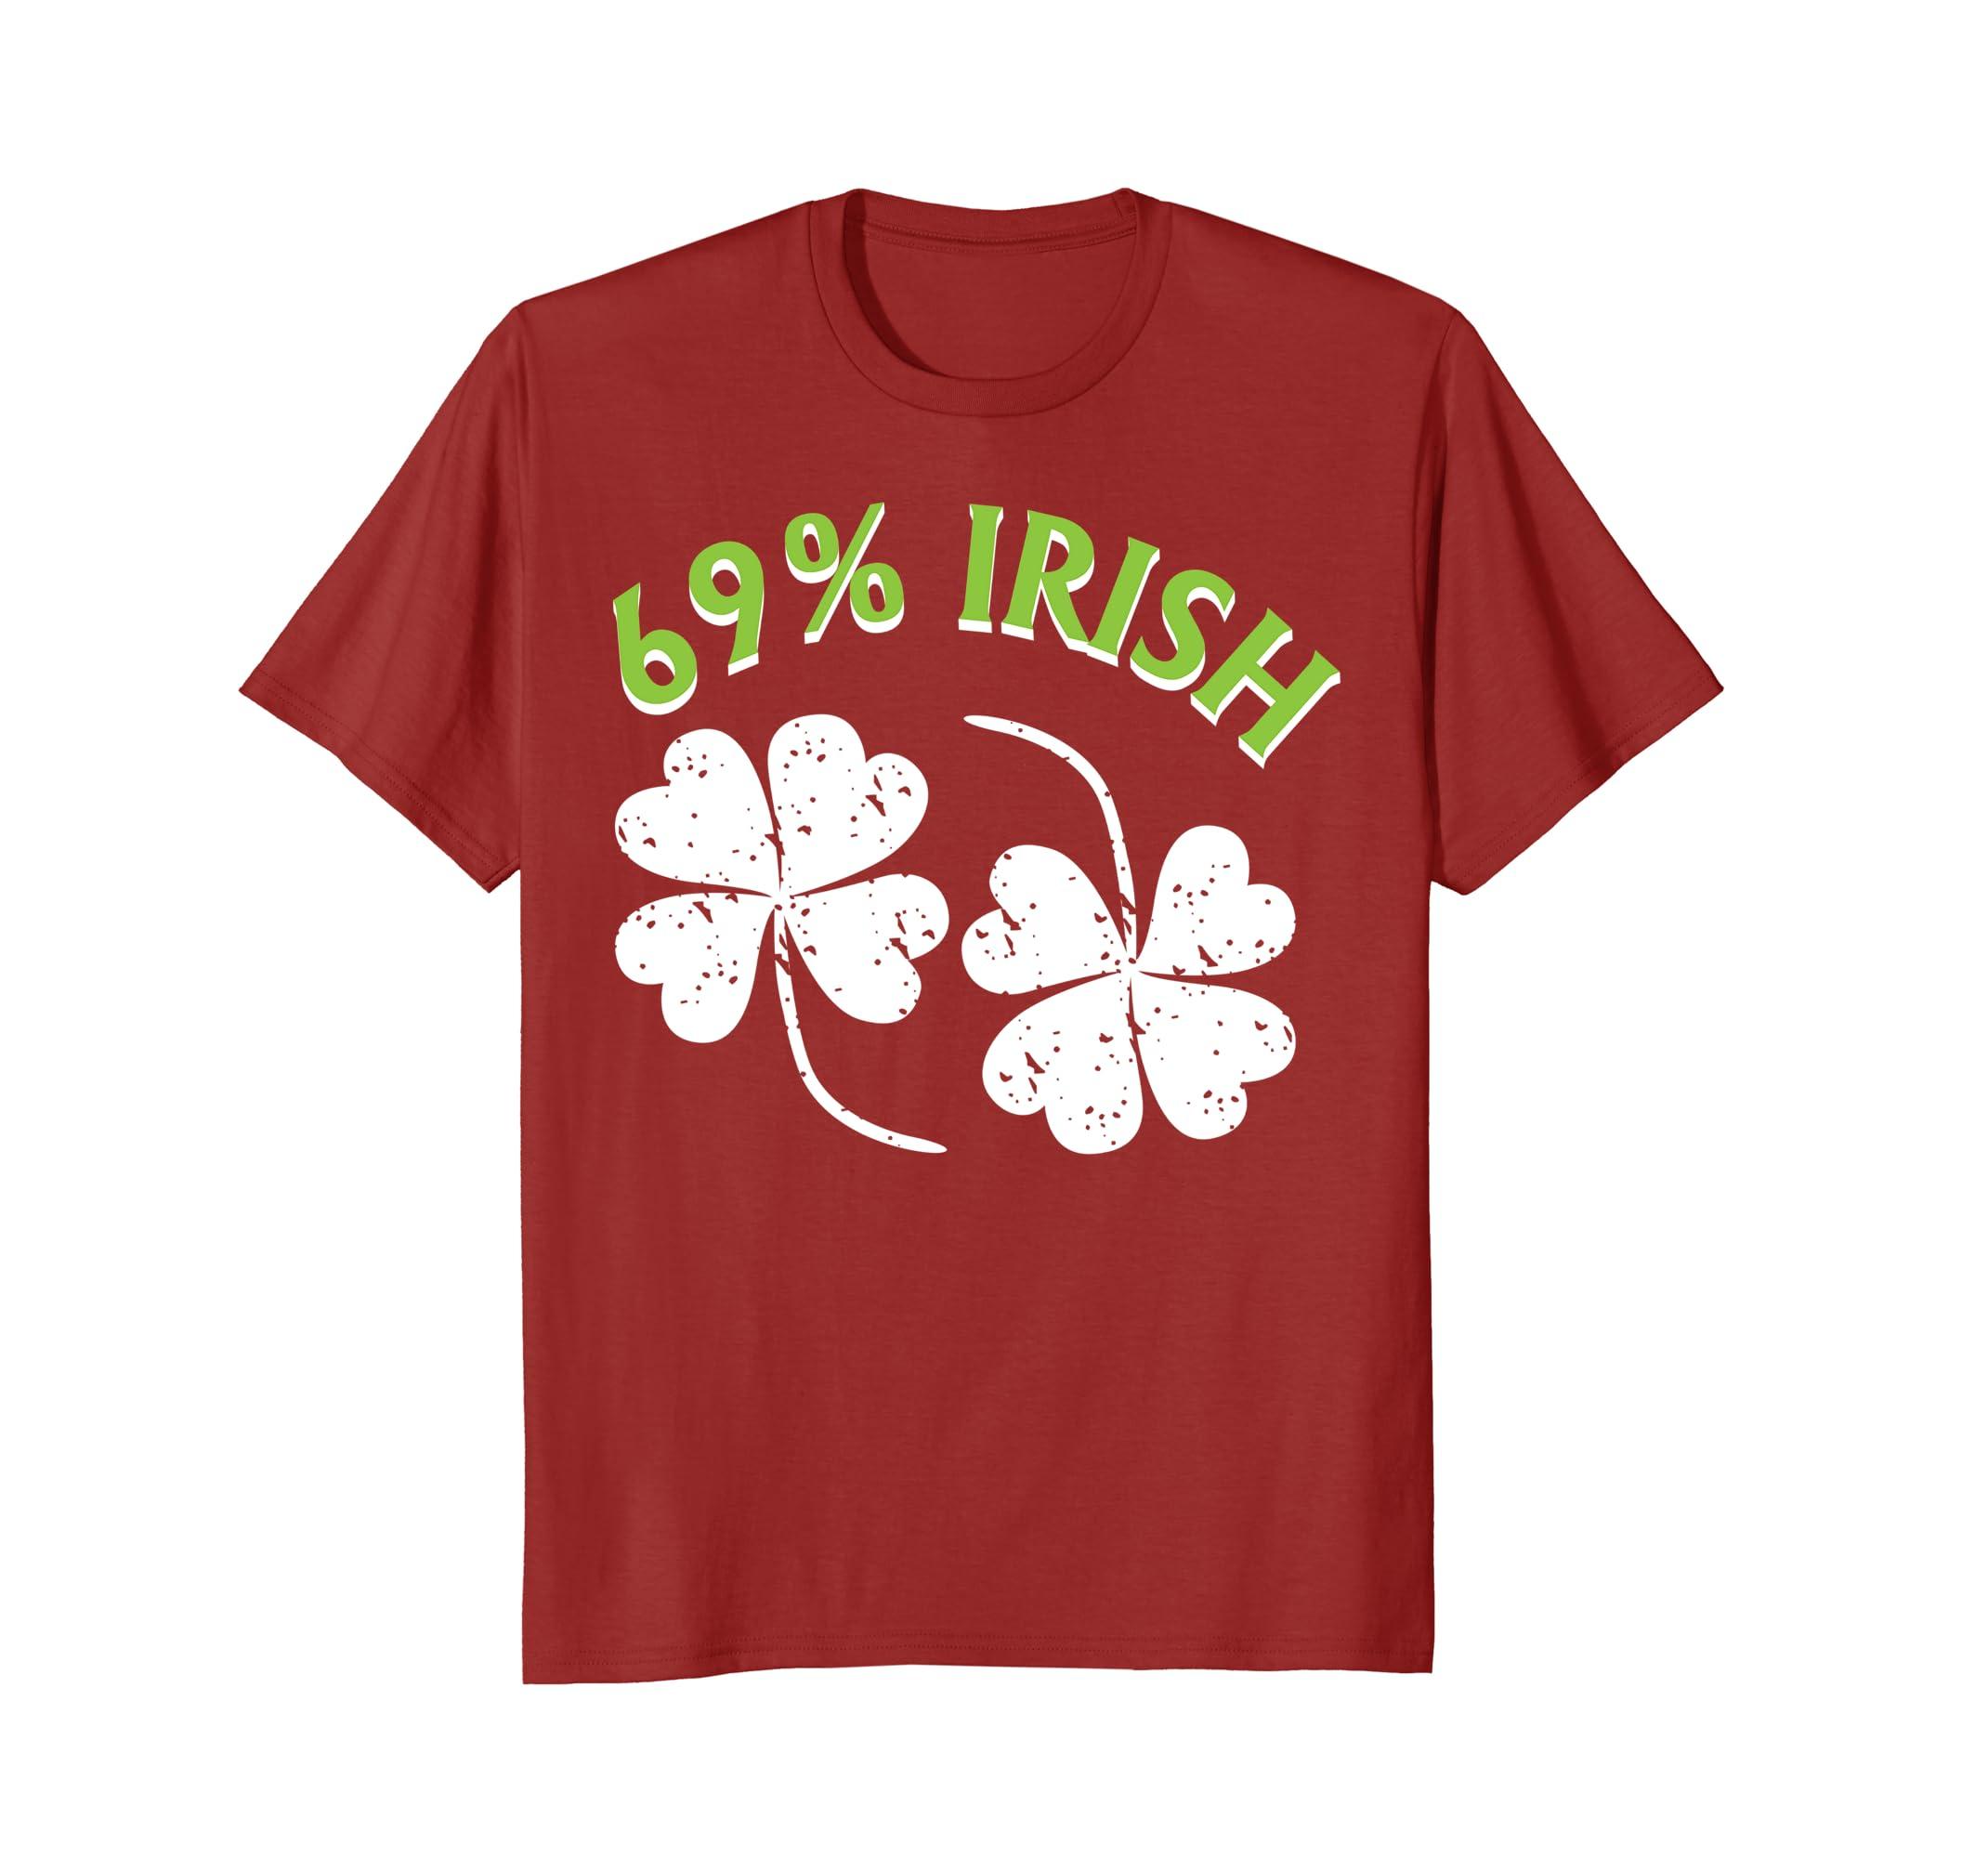 69% Irish T-Shirt - Cool Adults St. Patrick's Day Tee Gift-ah my shirt one gift